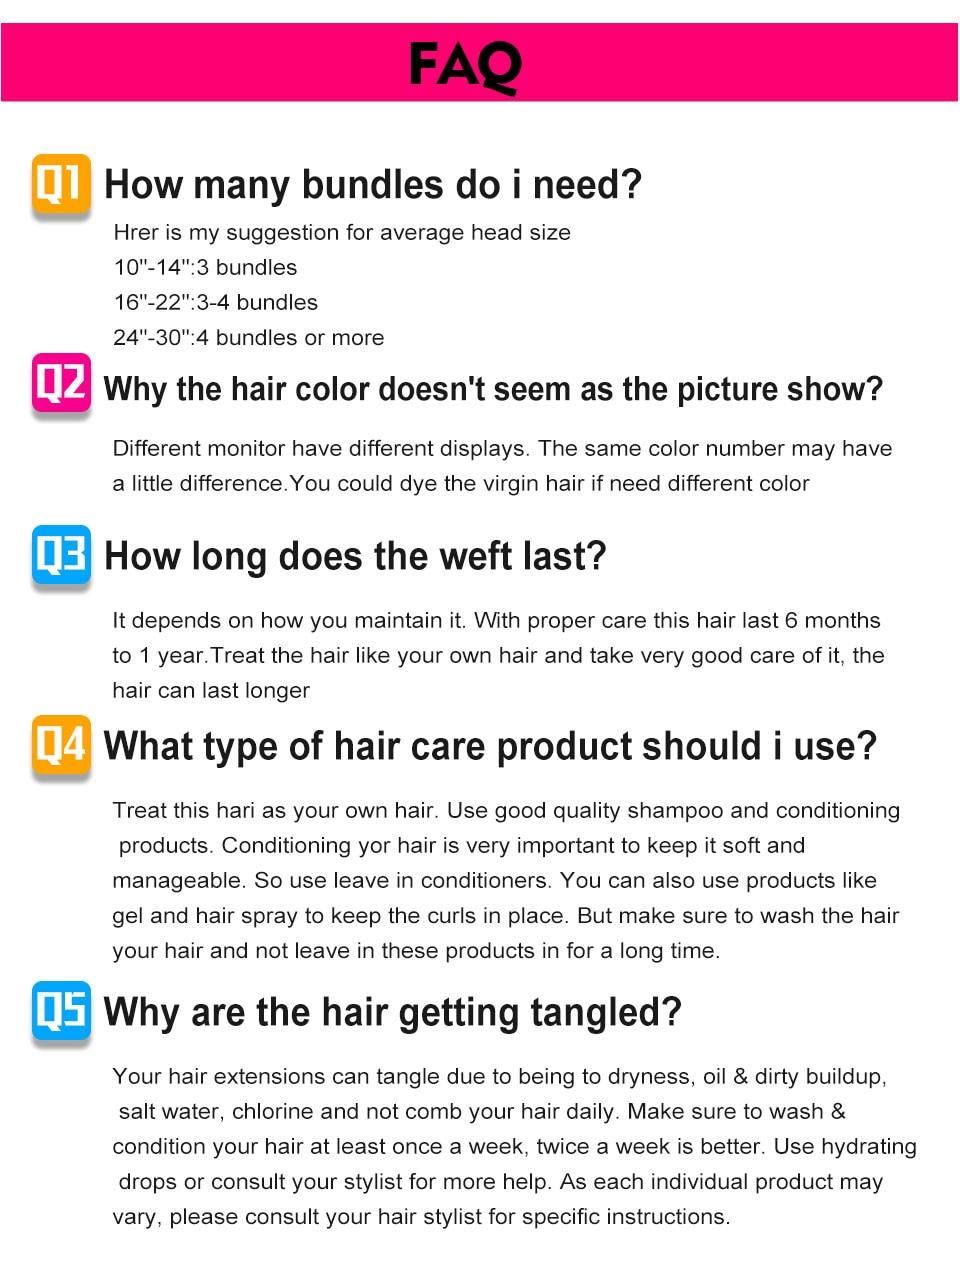 hair 1 (7)